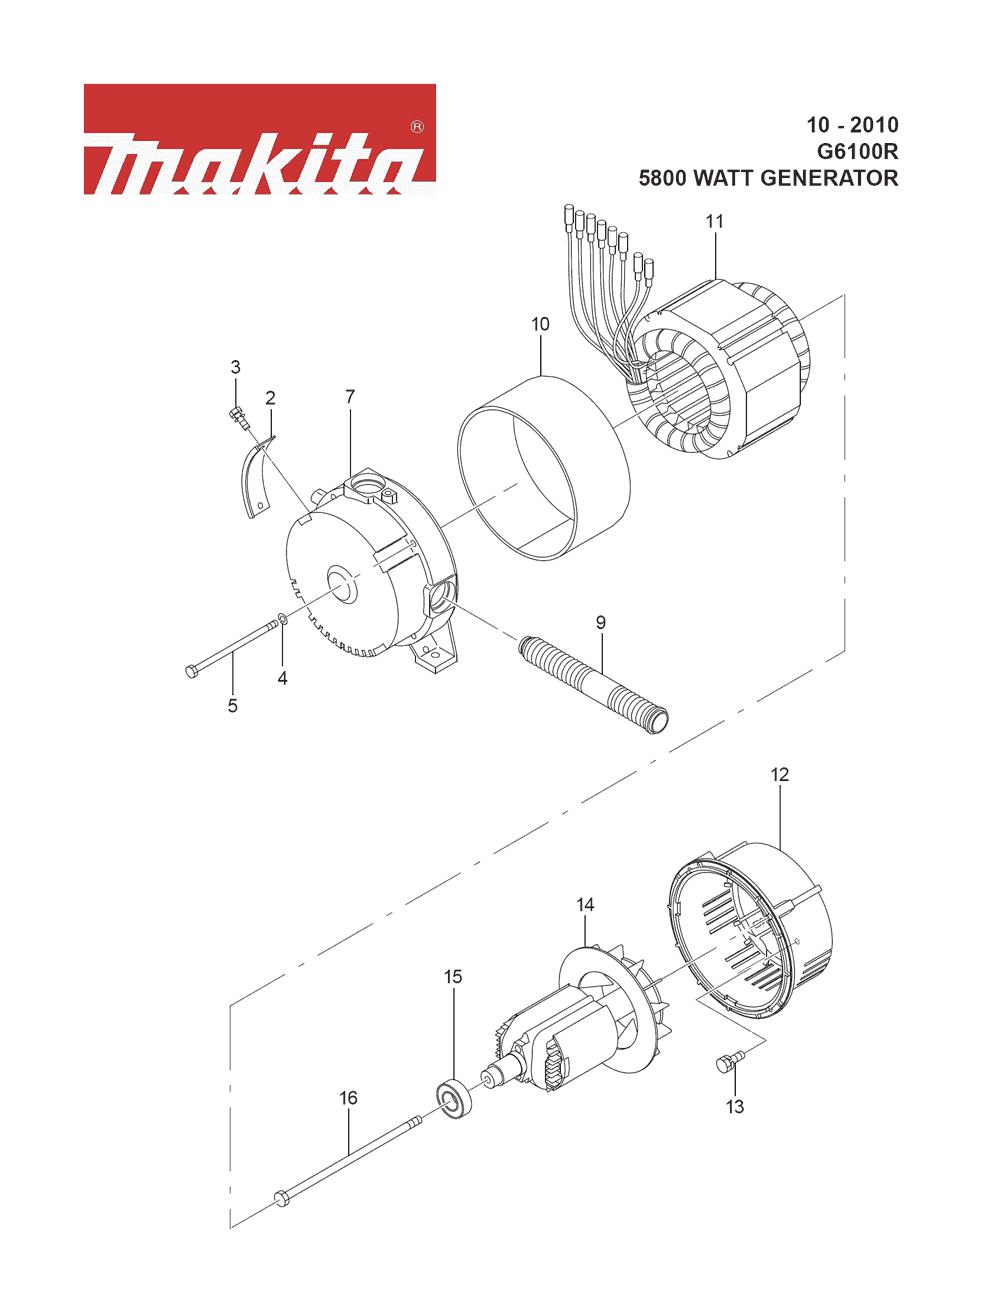 Makita G6100R-Type-2 Parts List | Makita G6100R-Type-2 Repair Parts on